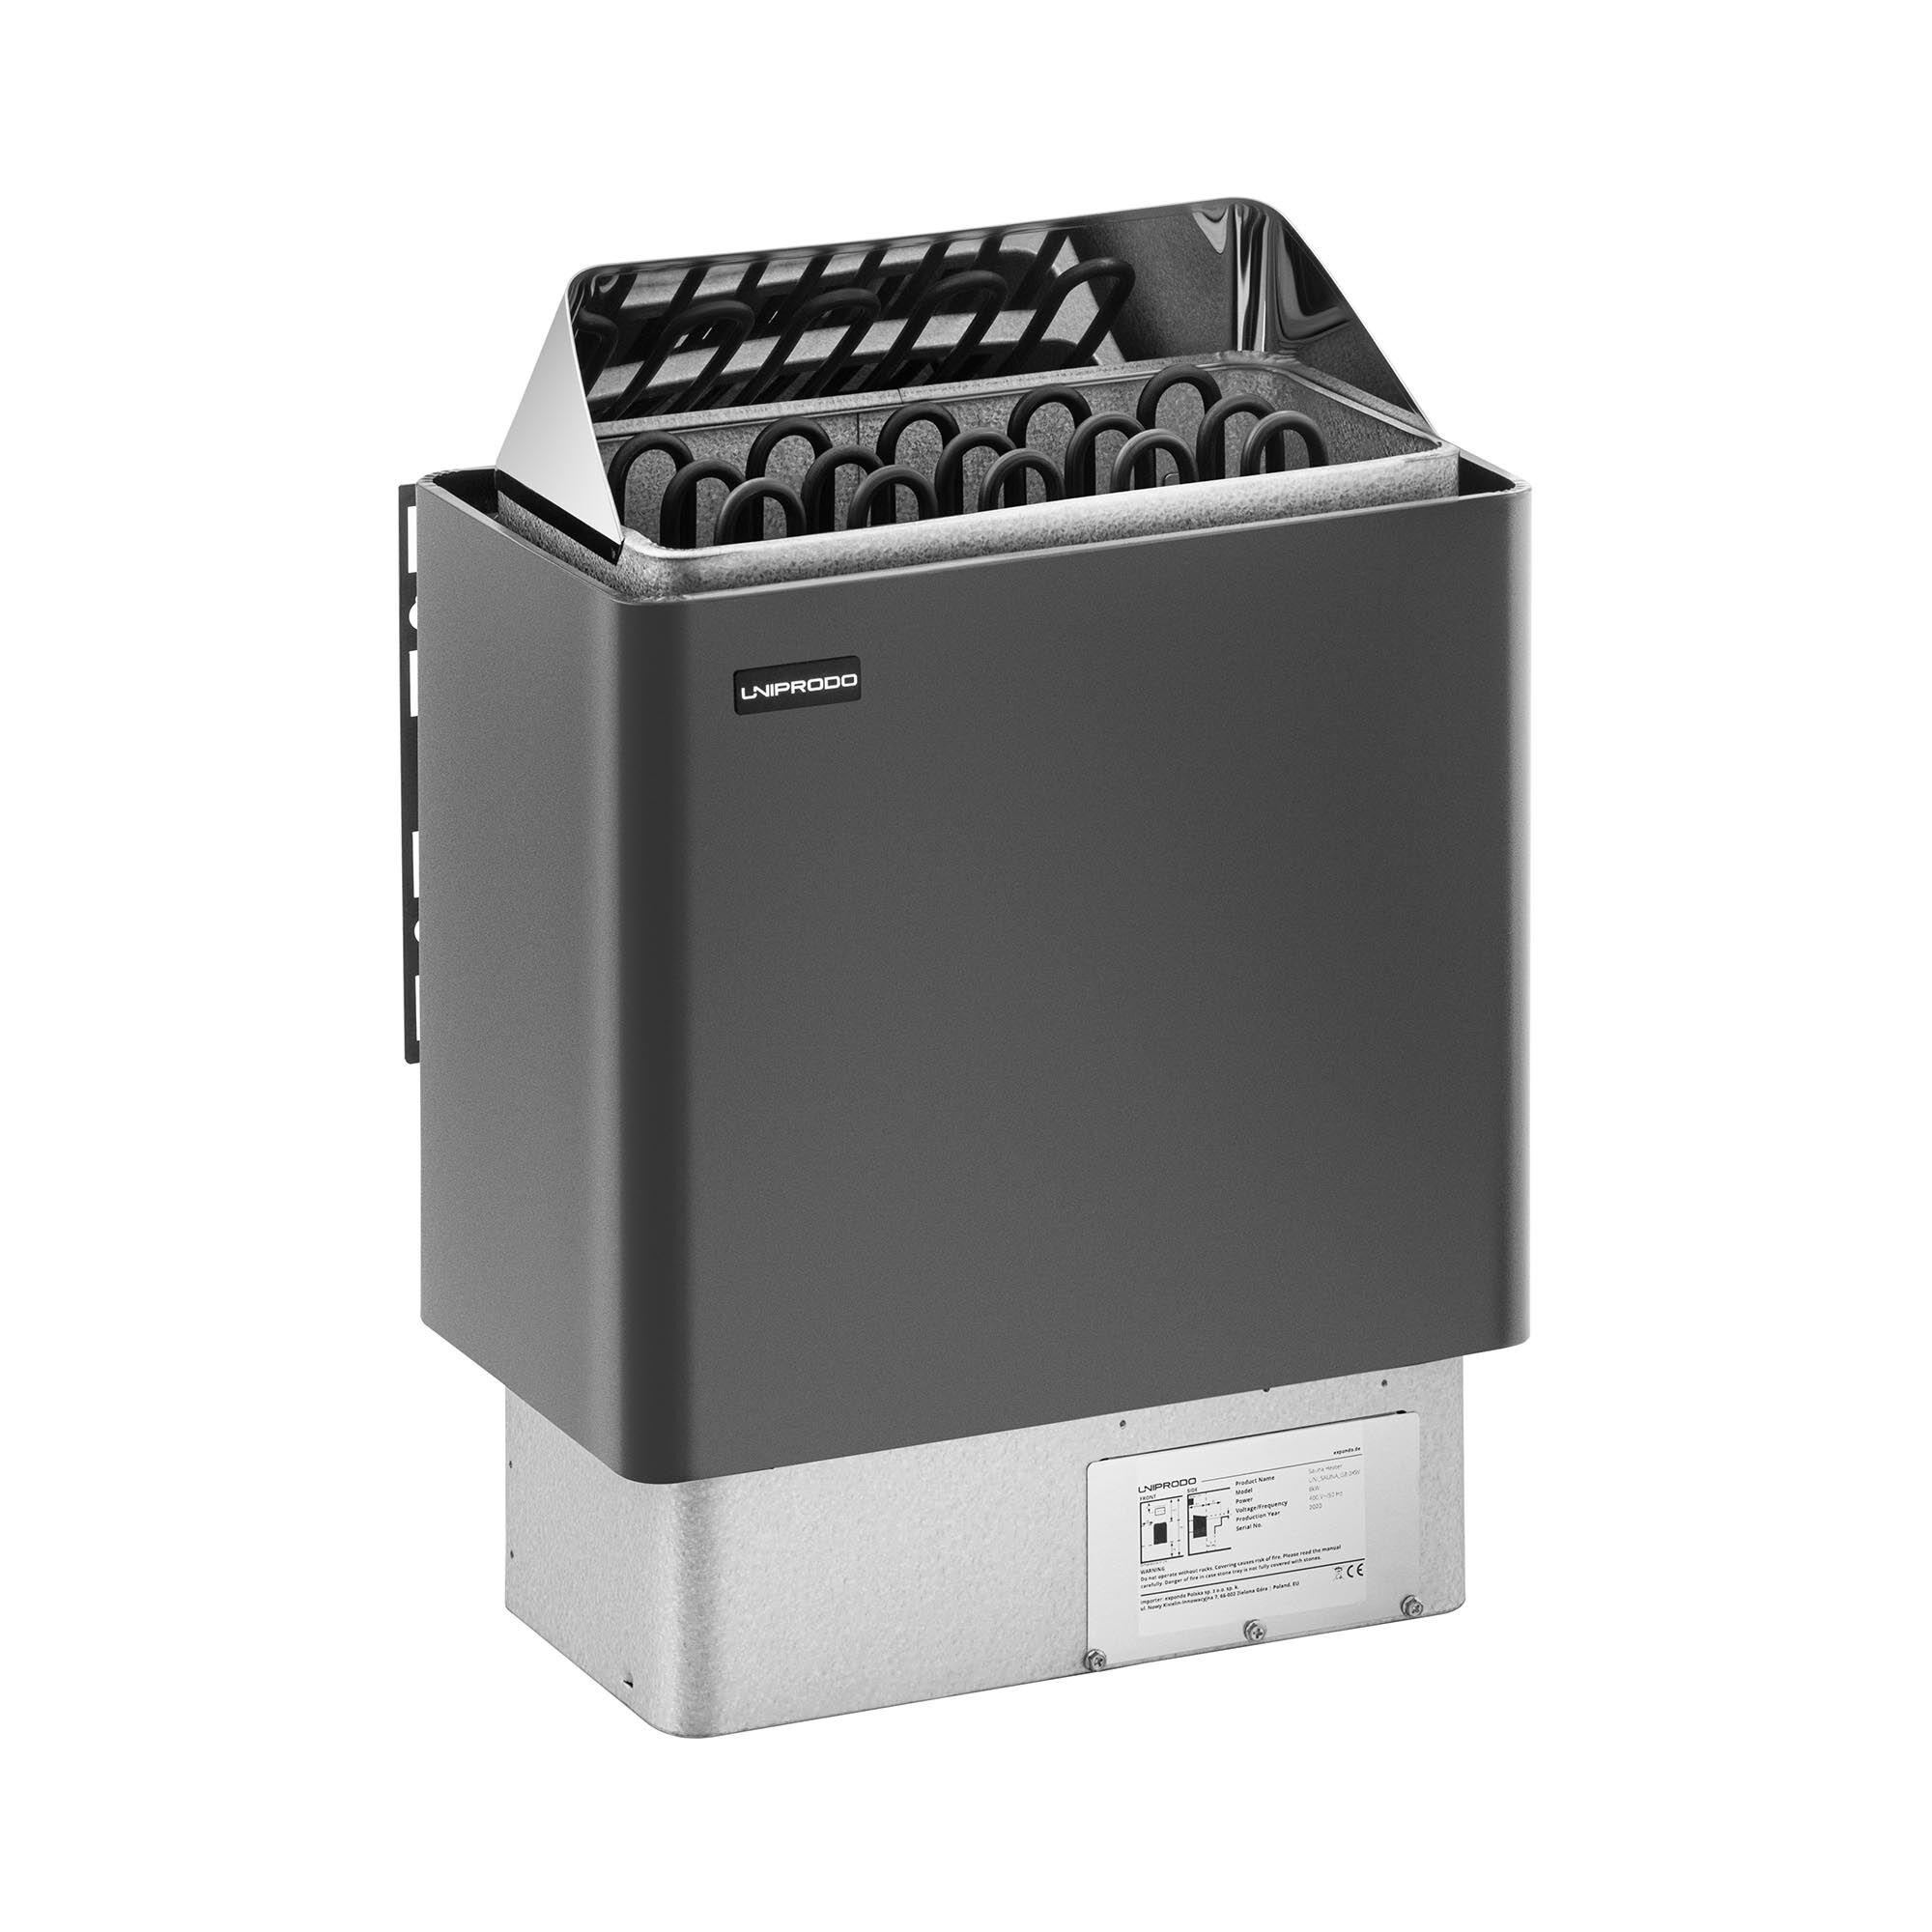 Uniprodo Poêle pour sauna - 8 kW - 30 à 110 °C UNI_SAUNA_G8.0KW